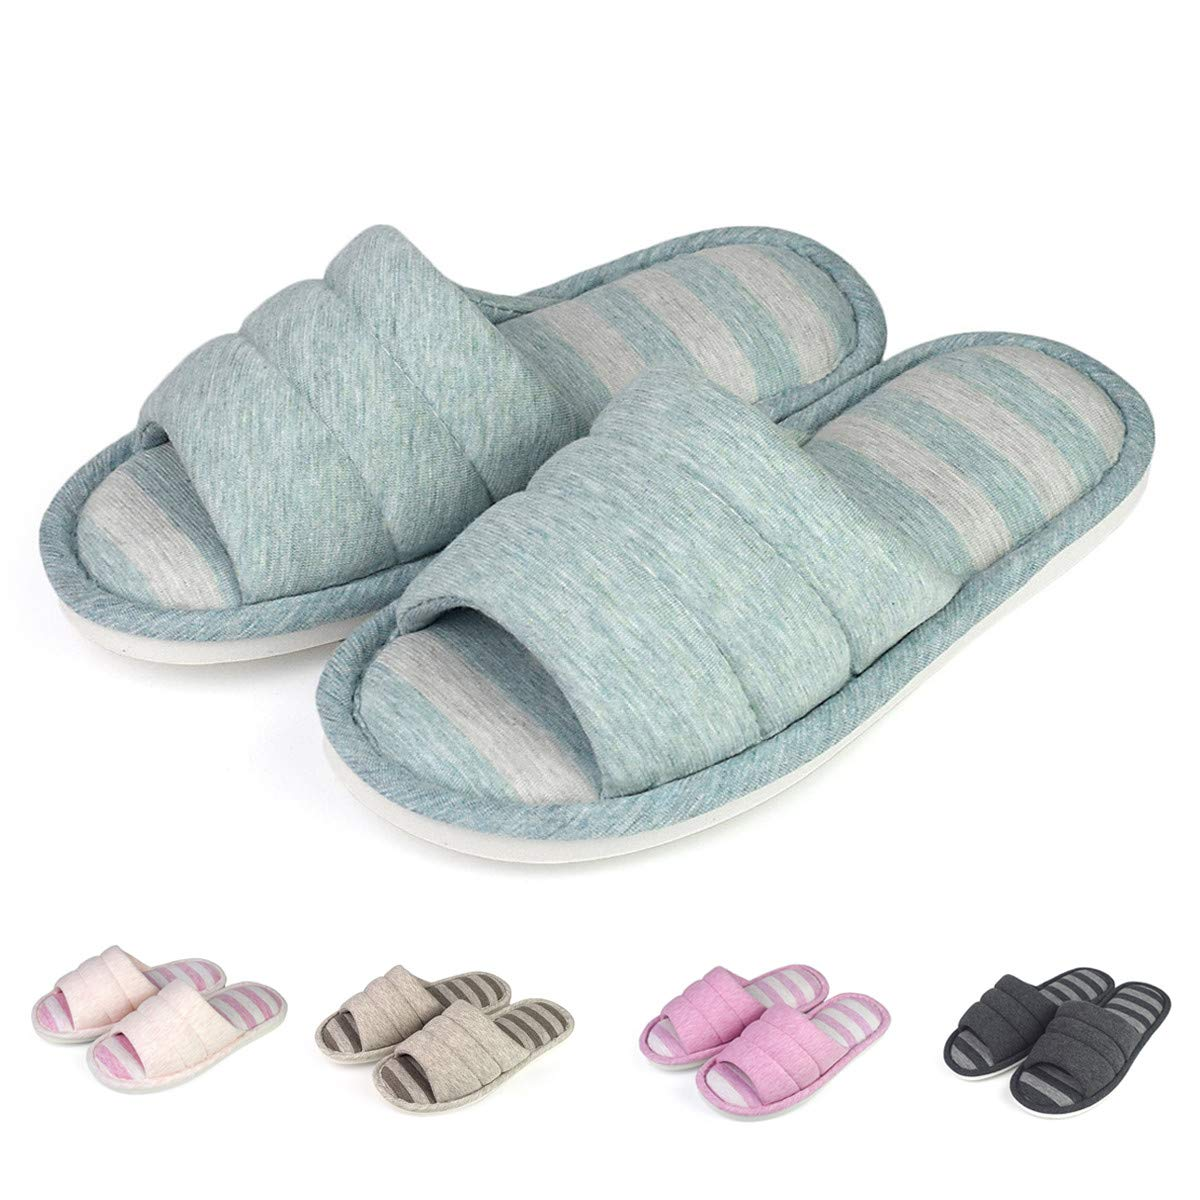 Women Comfort Indoor Slippers Open Toe Cotton Memory Foam Slip On House Slippers(Women 6-7 B(M) / Men 5.5-6.5 D(M),Blue)